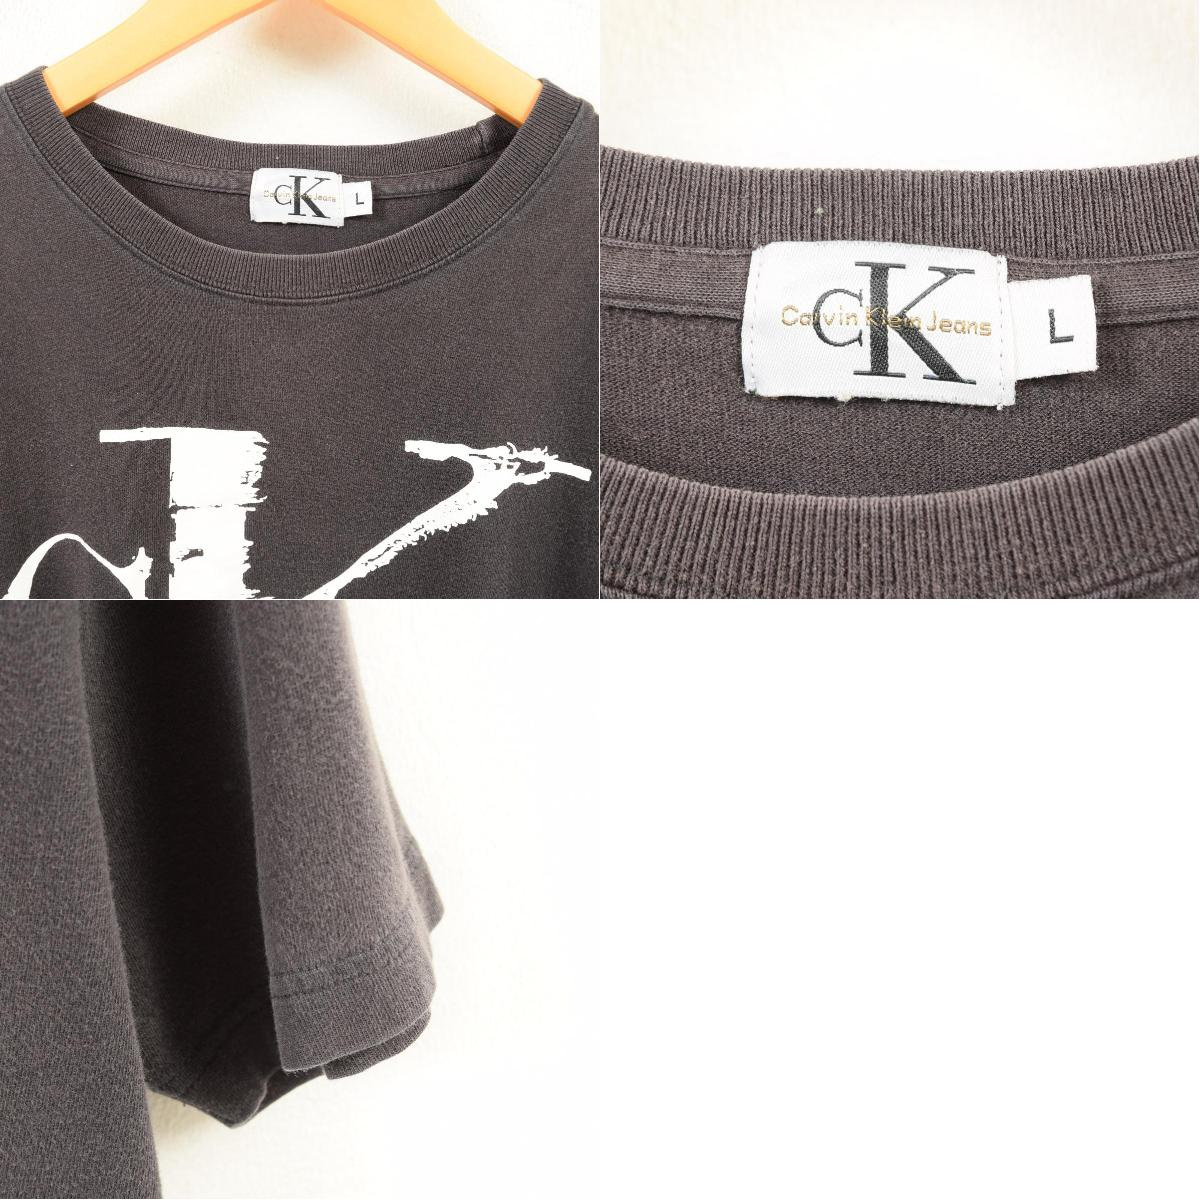 45a6c29a1 VINTAGE CLOTHING JAM: 90s Calvin Klein Calvin klein JEANS logo T ...